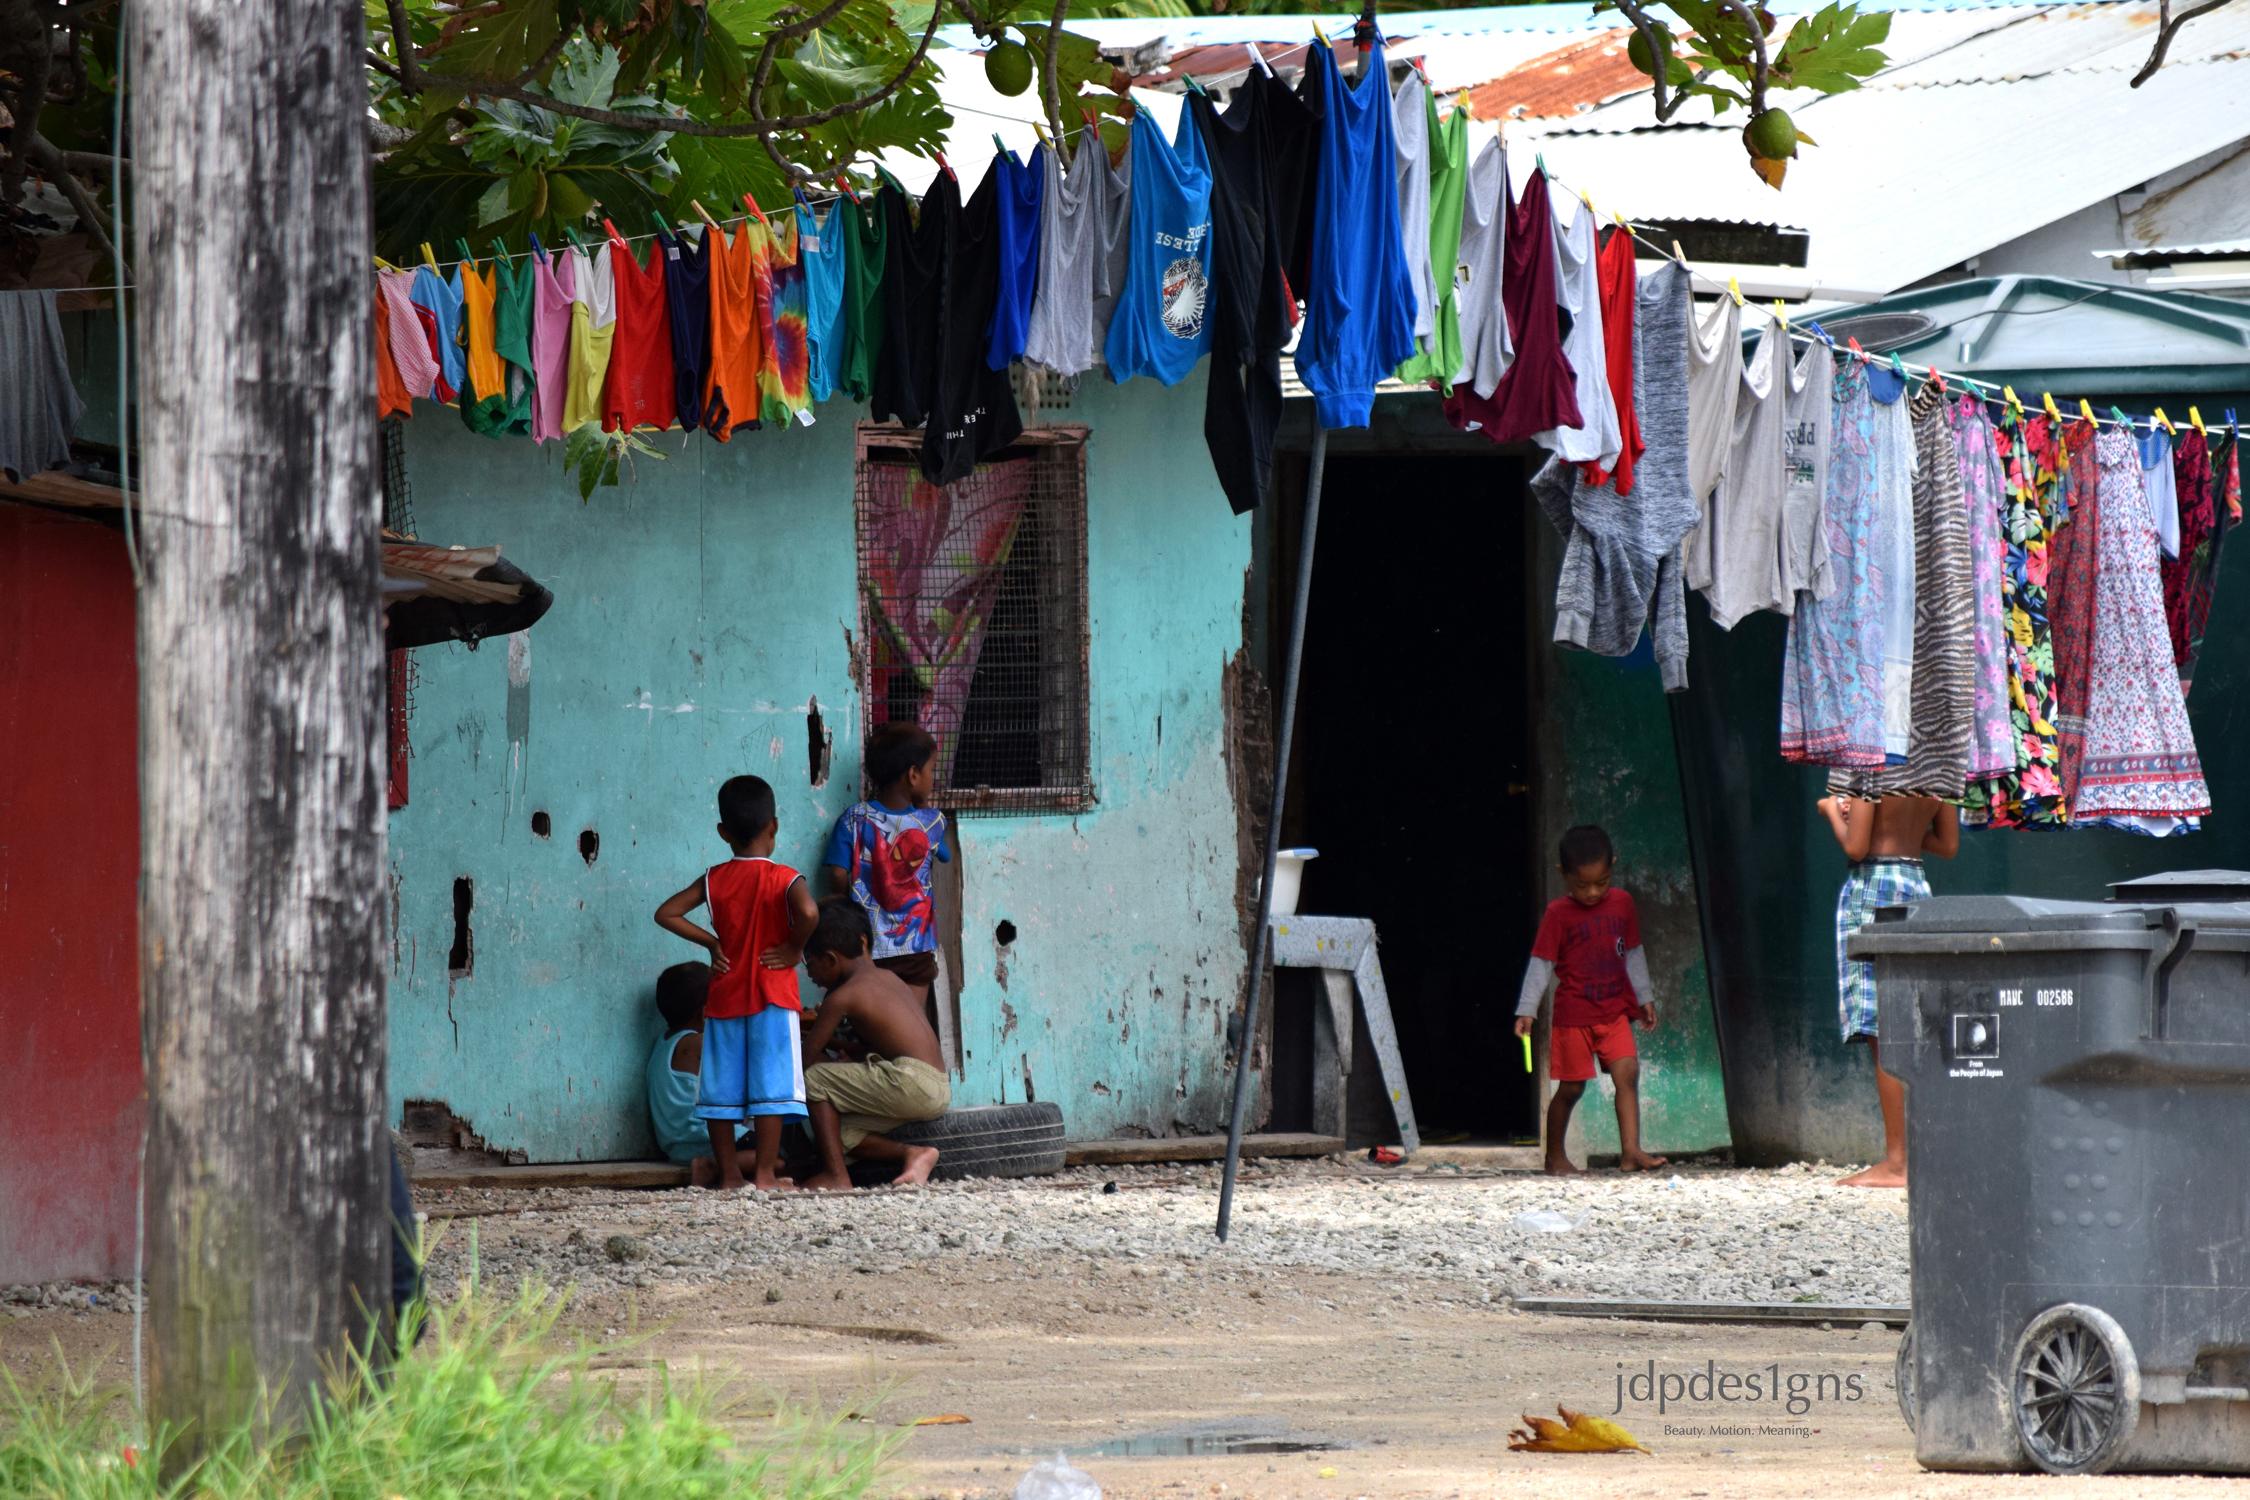 Laundry Line House Resize.jpg